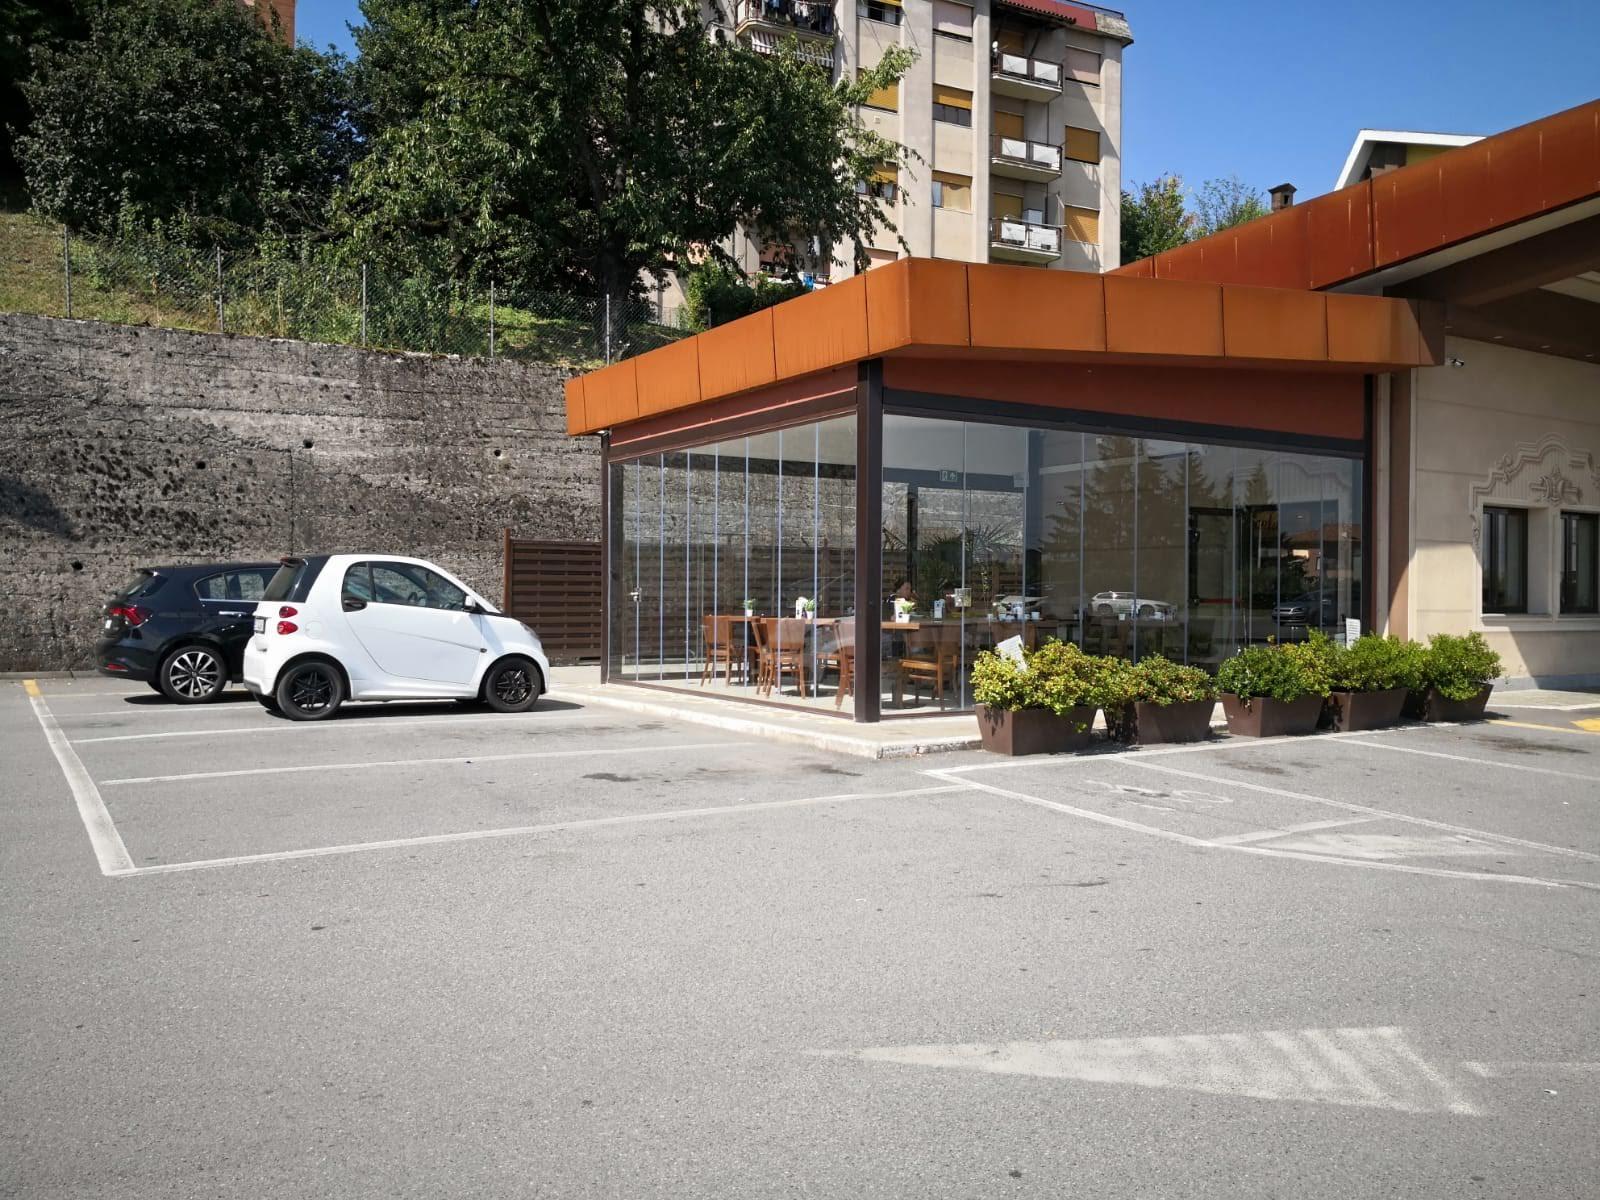 domus_point_pergola_serravalle_7